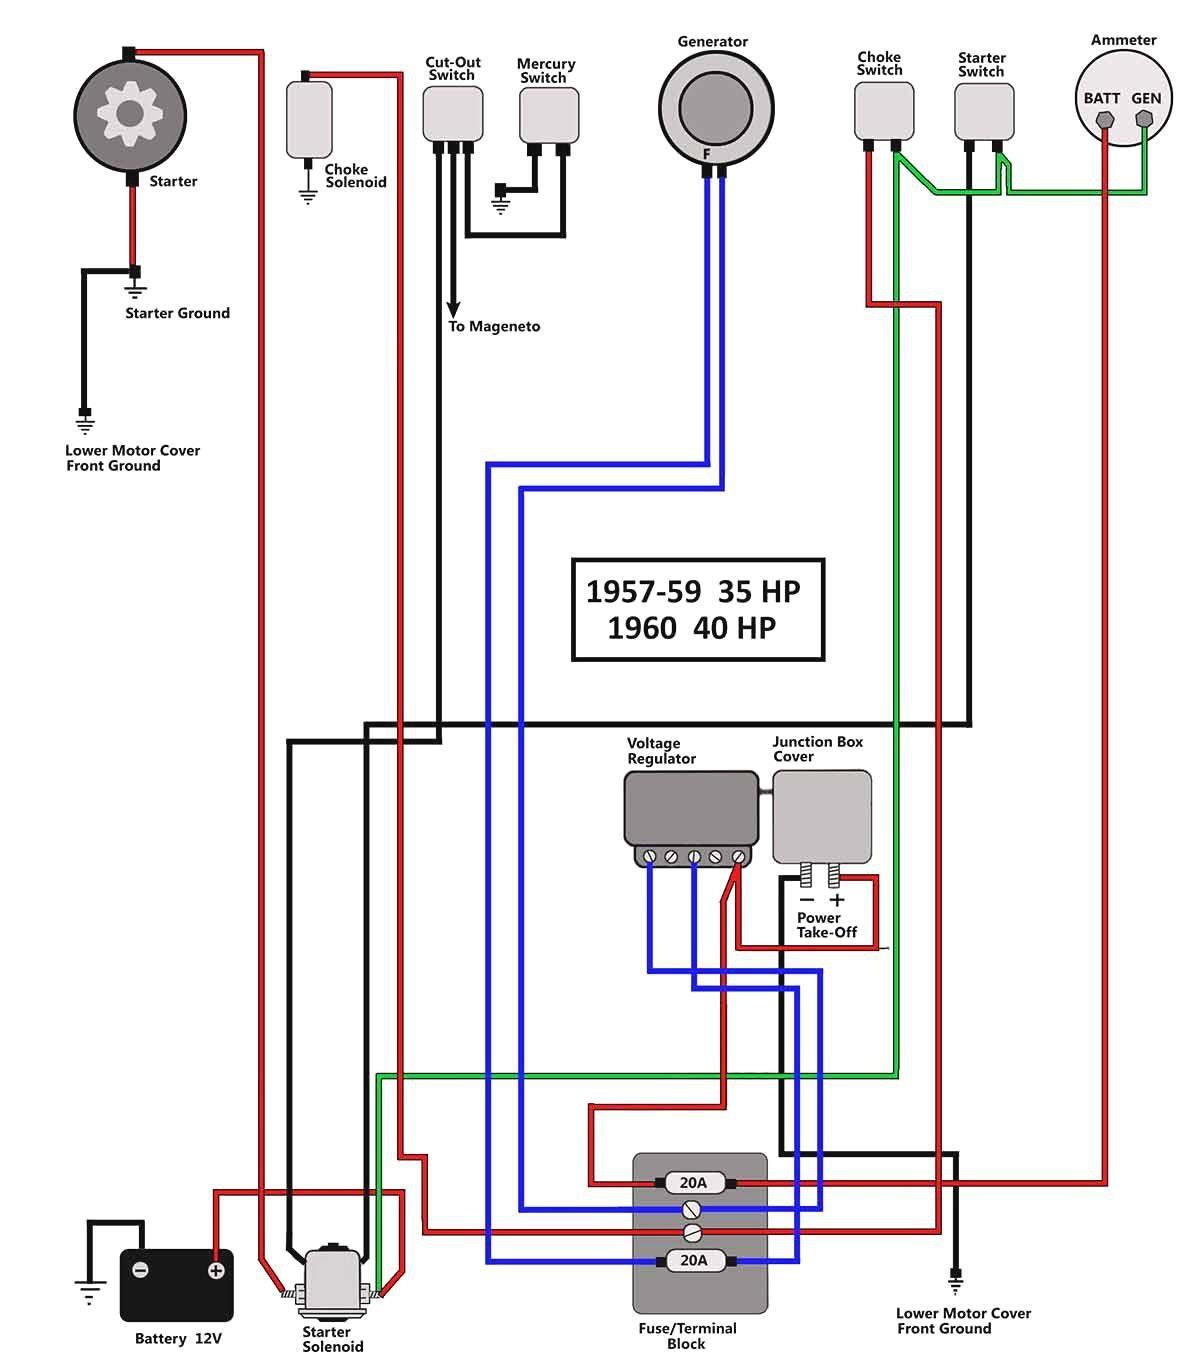 35 Hp Mercury Outboard Wiring Diagram